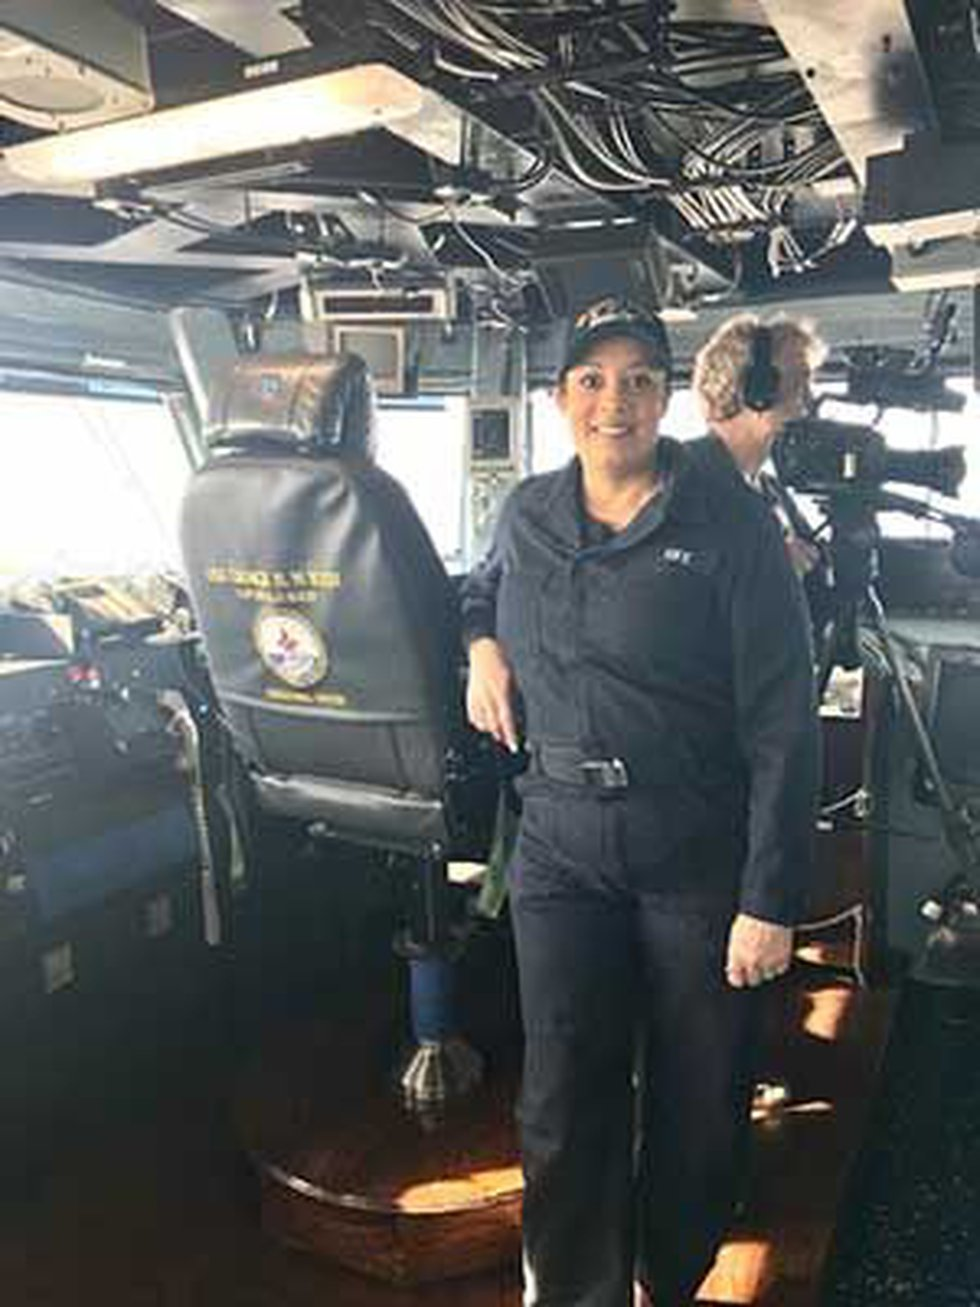 Dawne Gee in uniform aboard the U.S.S. George H. W. Bush (Source: Dawne Gee)